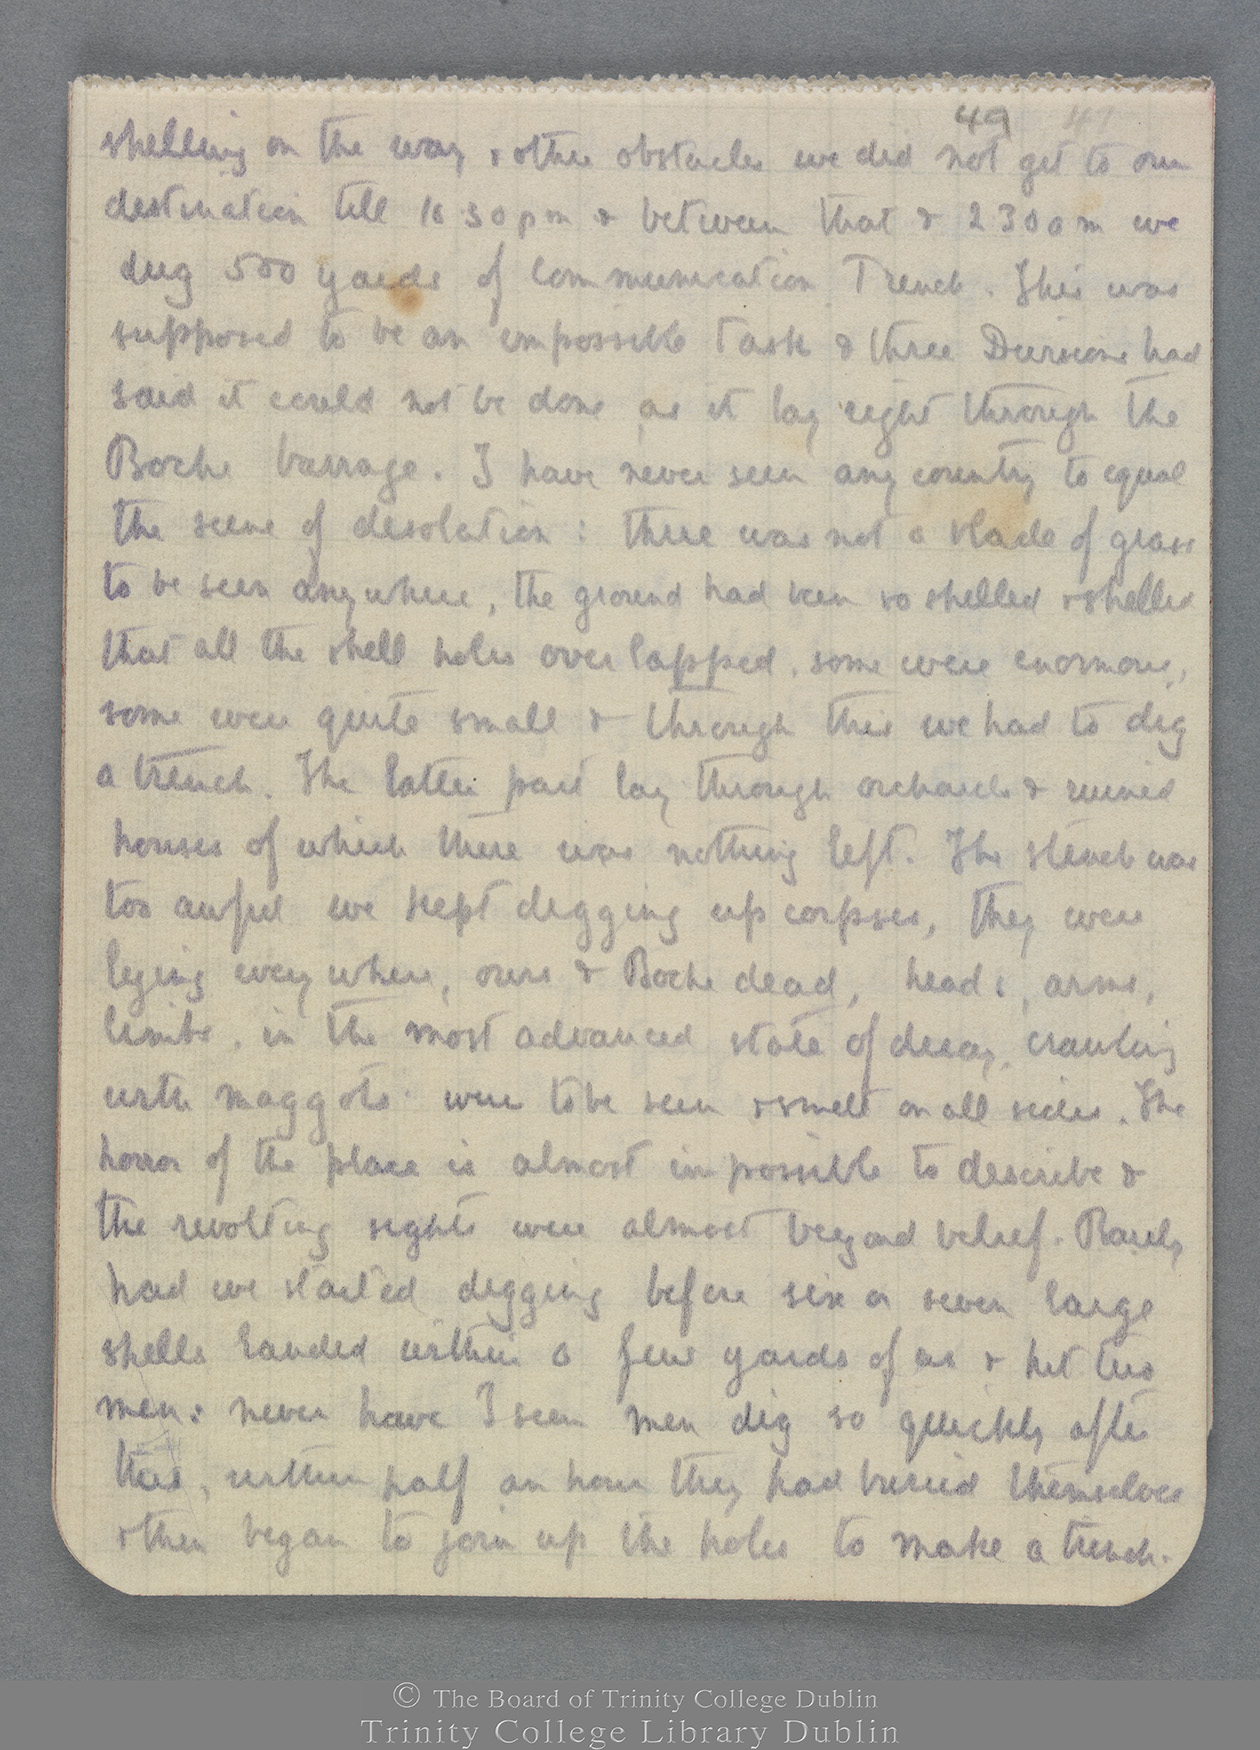 TCD MS 10821 folio 49 recto